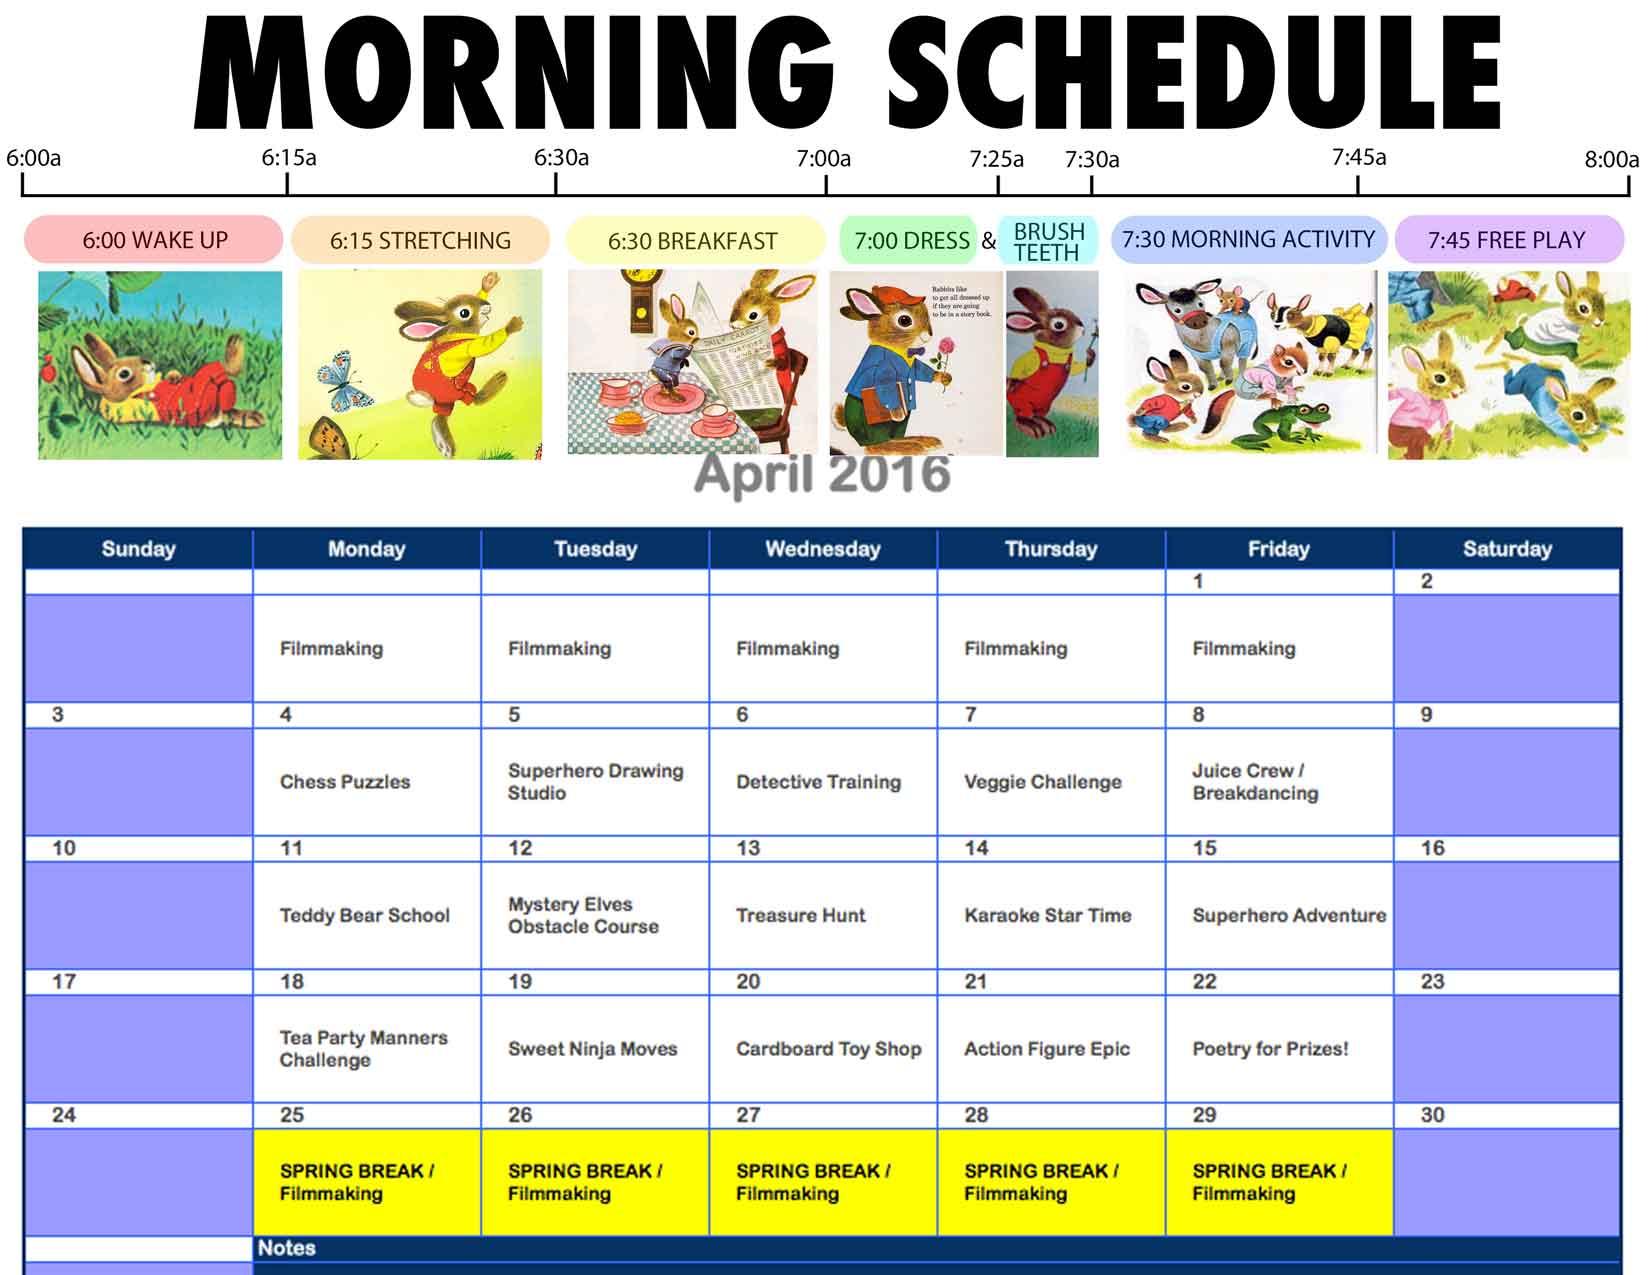 April schedule is ready! Three full weeks and then SPRING BREAK! Whooooooo!